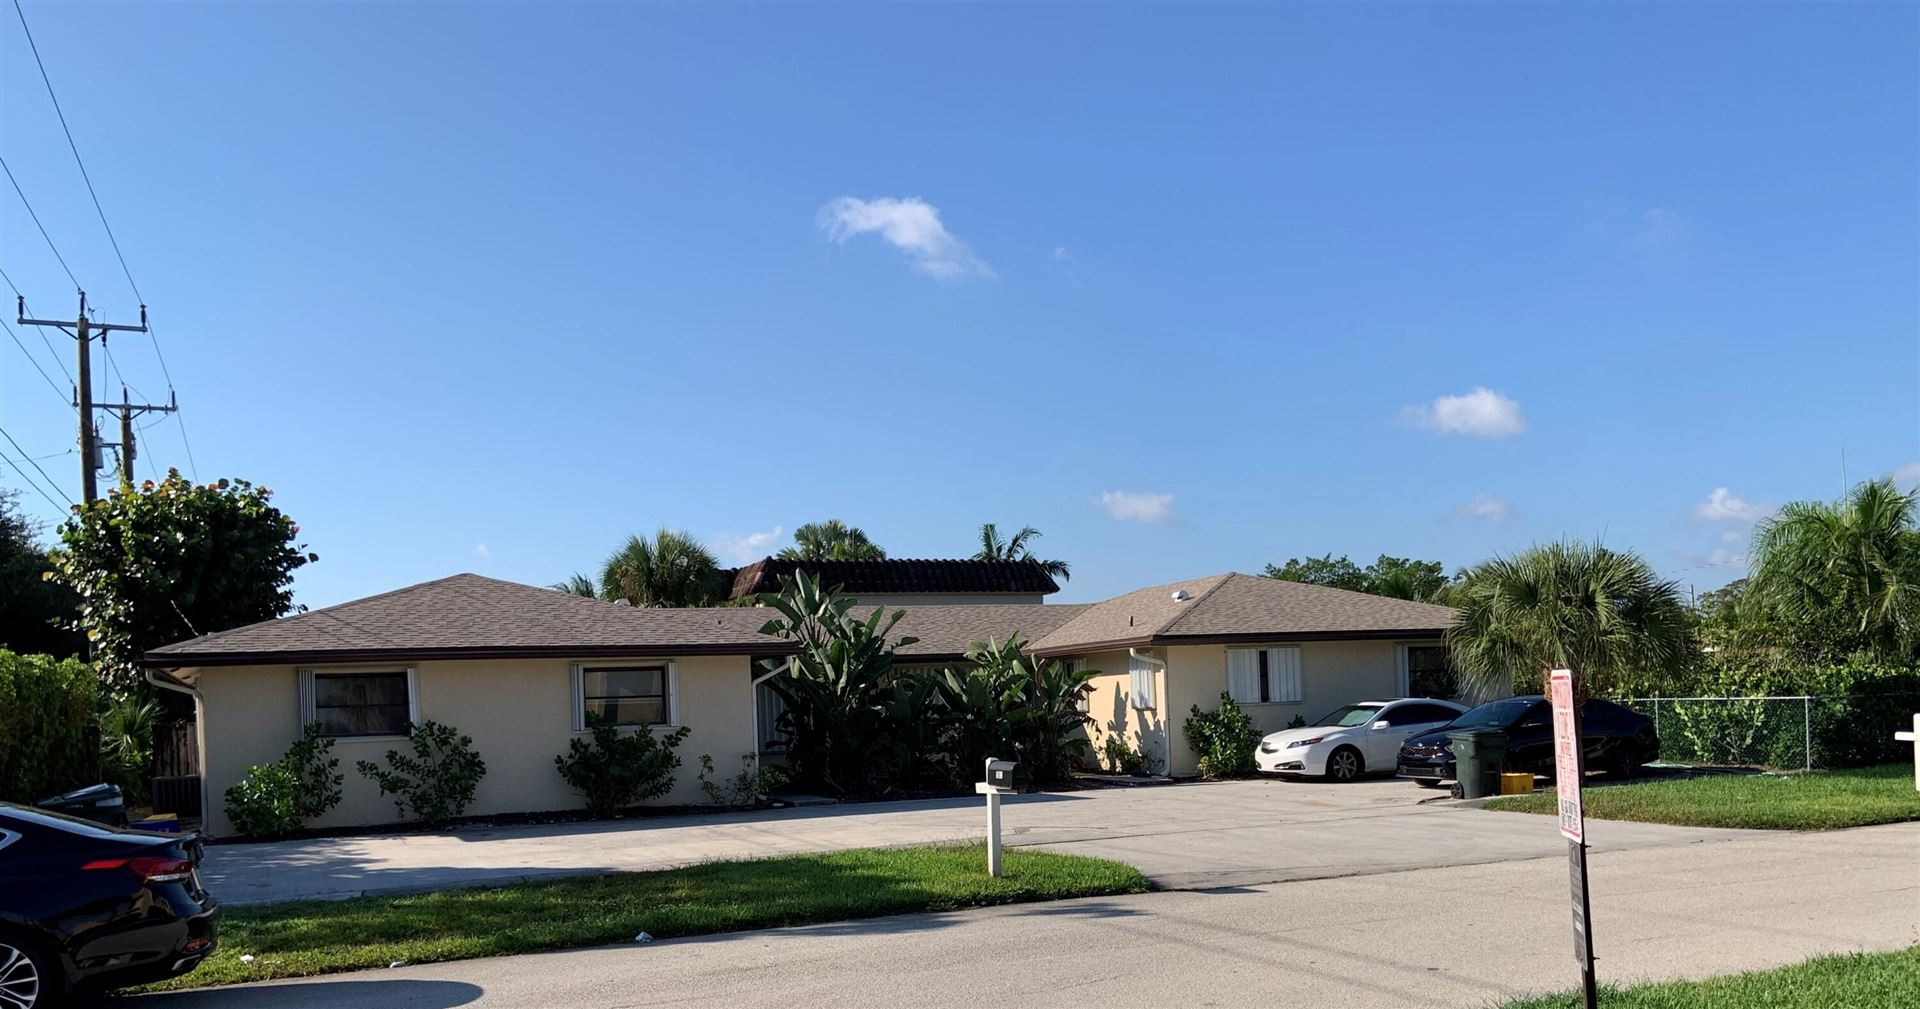 500 NE 48th Street, Boca Raton, FL 33431 - MLS#: RX-10752788